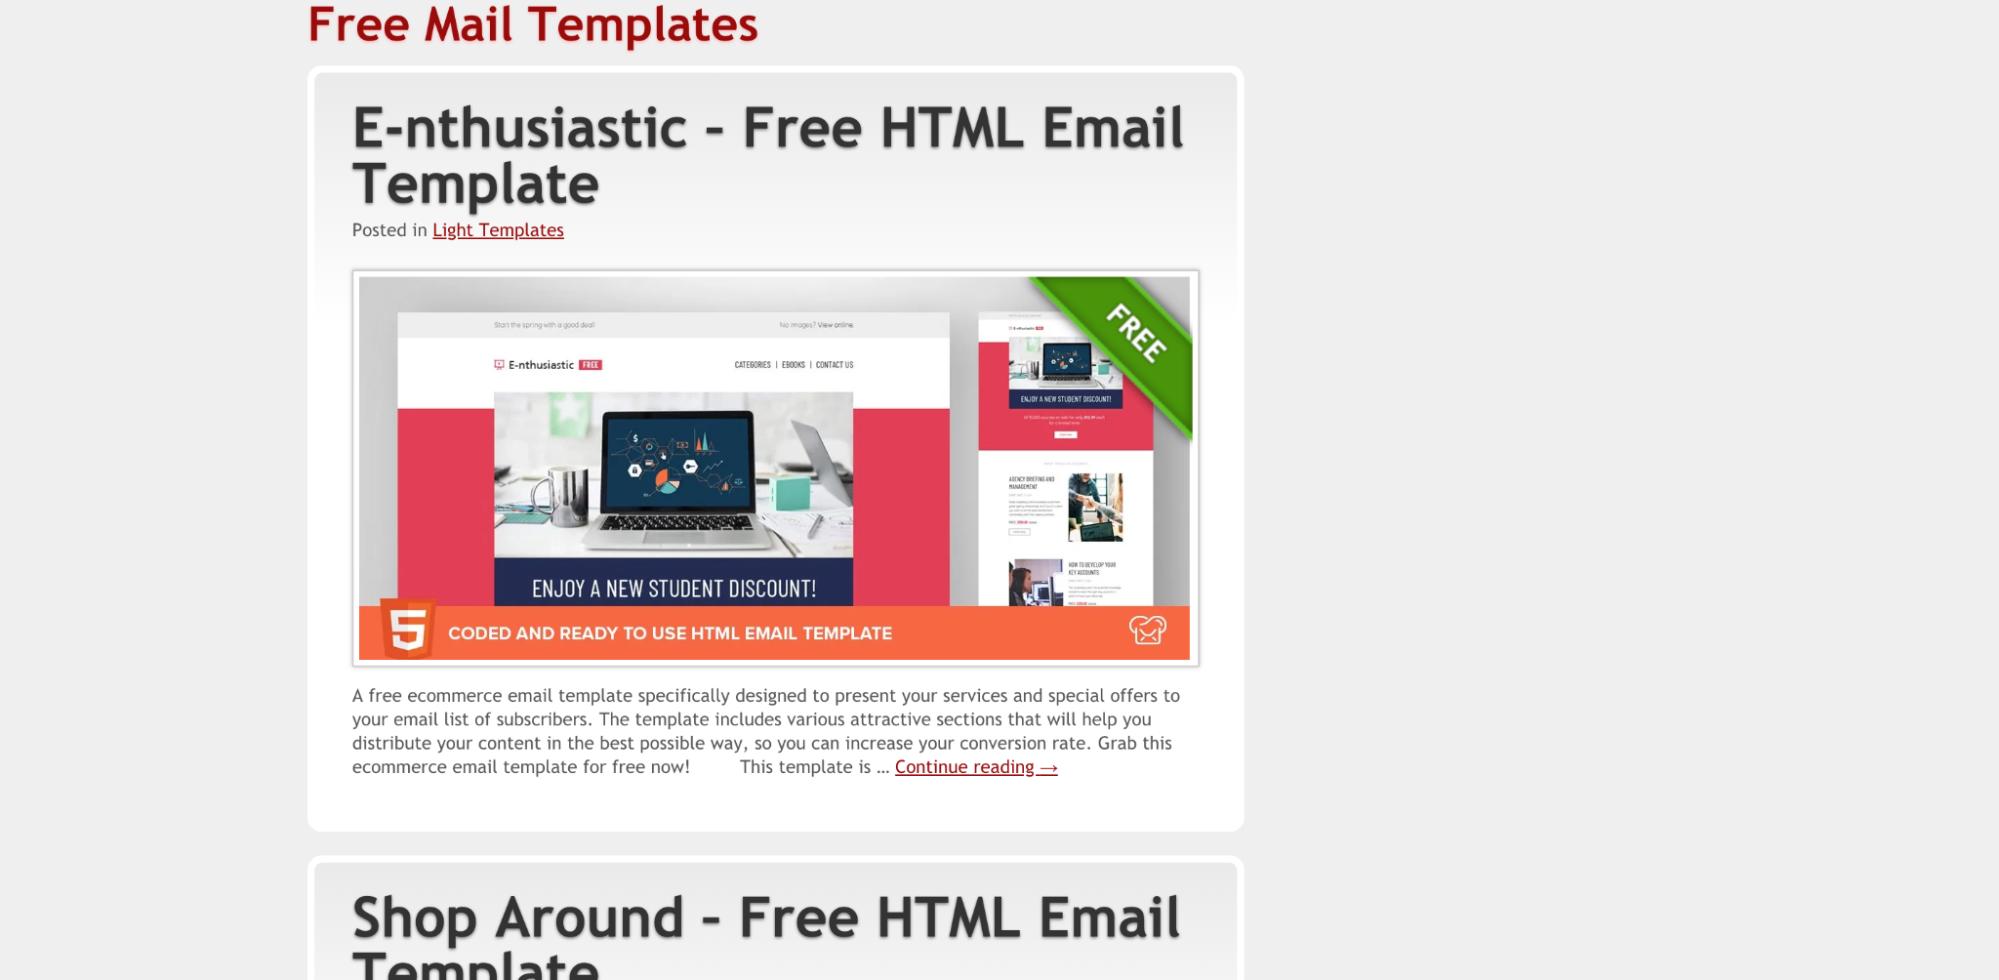 Free mail templates screenshot